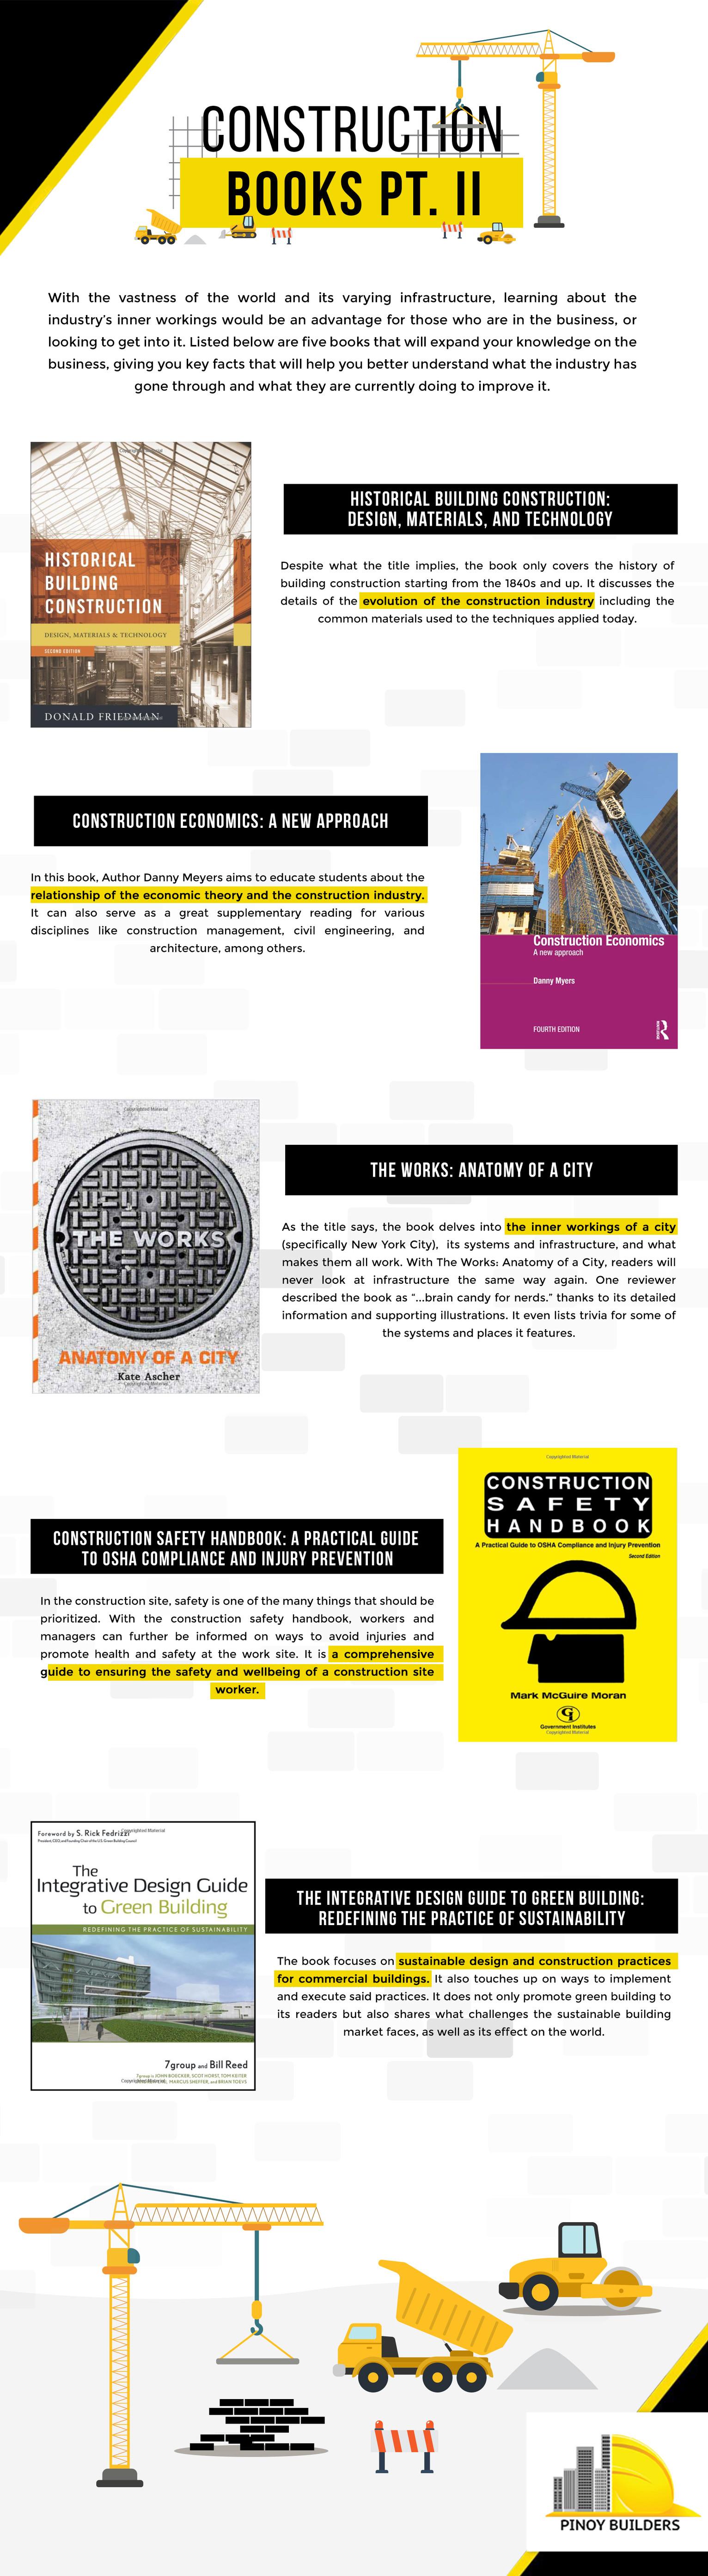 PB_Construction Books revised (1).jpg